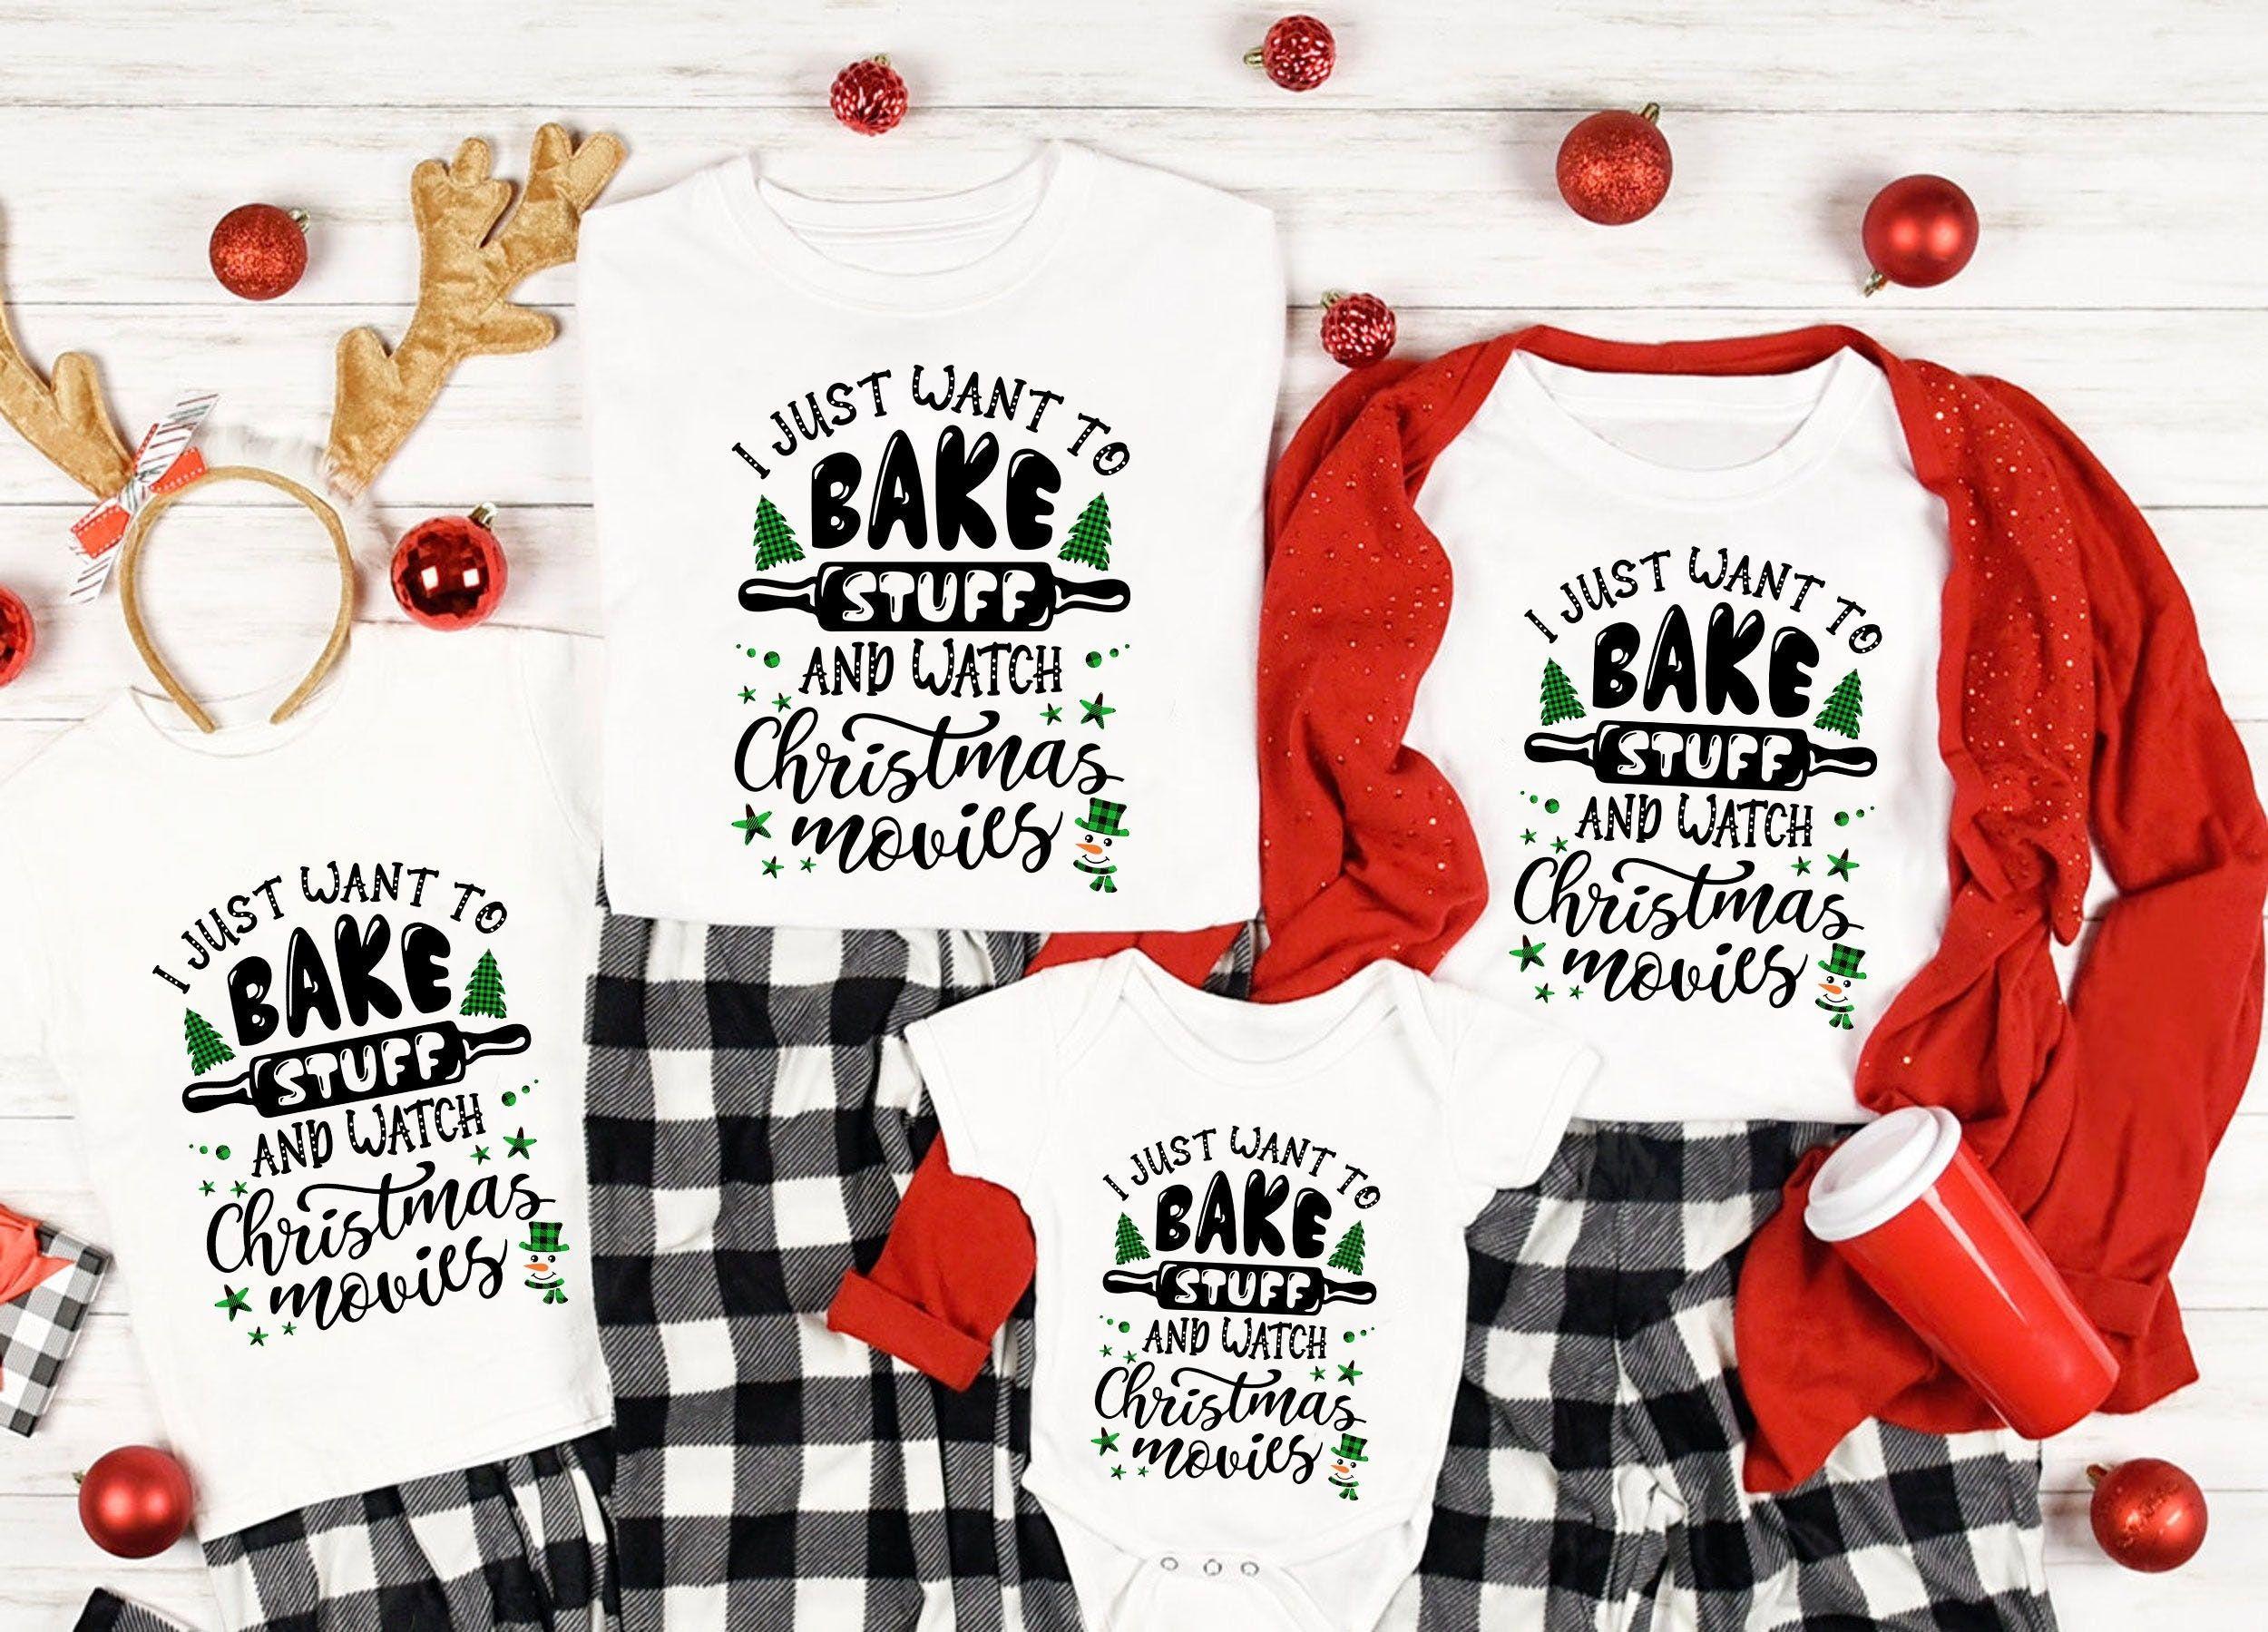 Family Matching Christmas Shirt, I Just Want to Bake Stuff and Watch Christmas Movies, Xmas Shirt, Merry Christmas Gifts